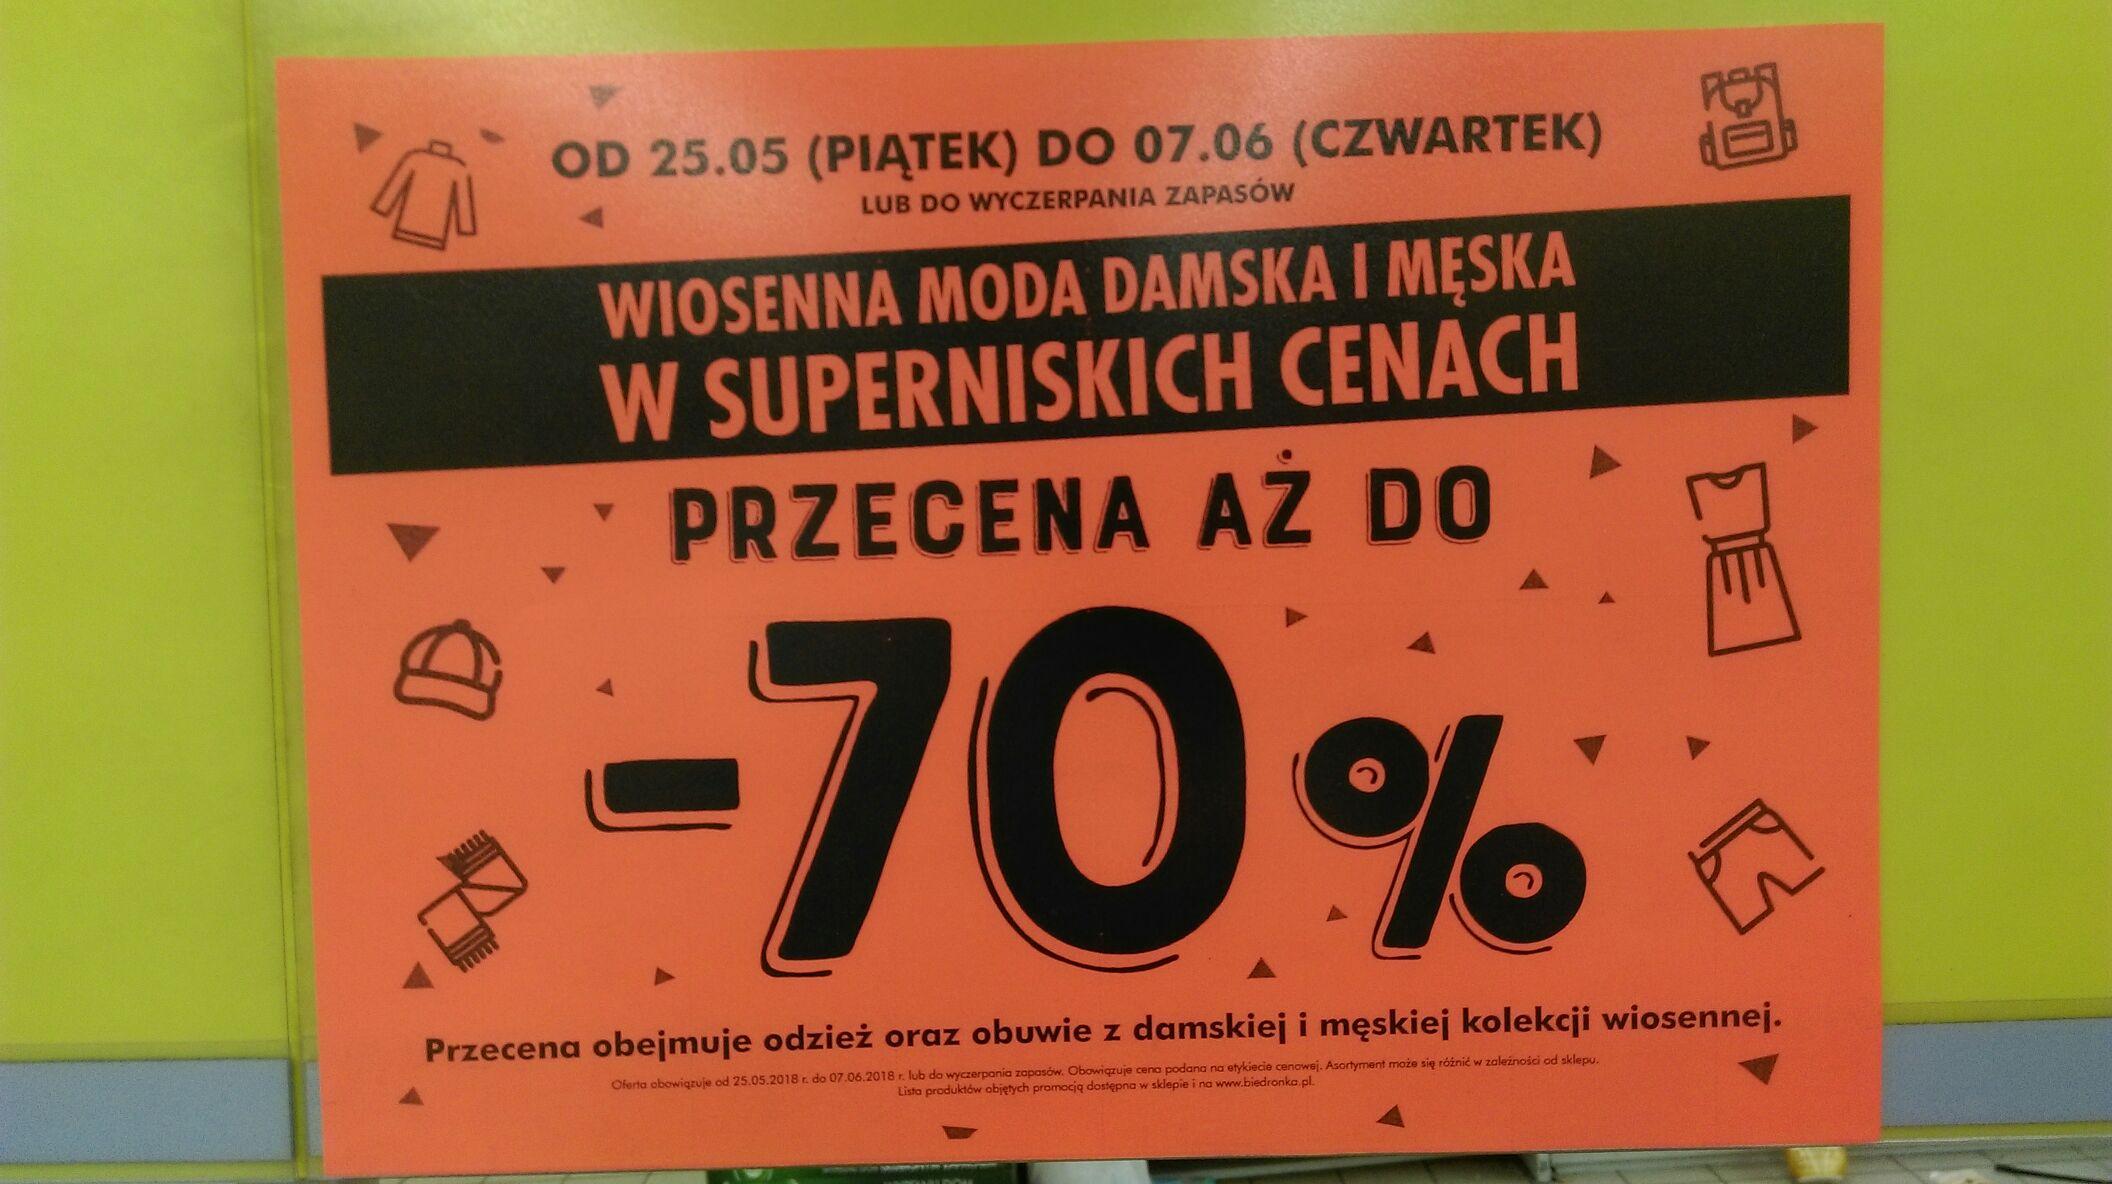 @Biedronka Wiosenna moda damska i męska do 70% taniej